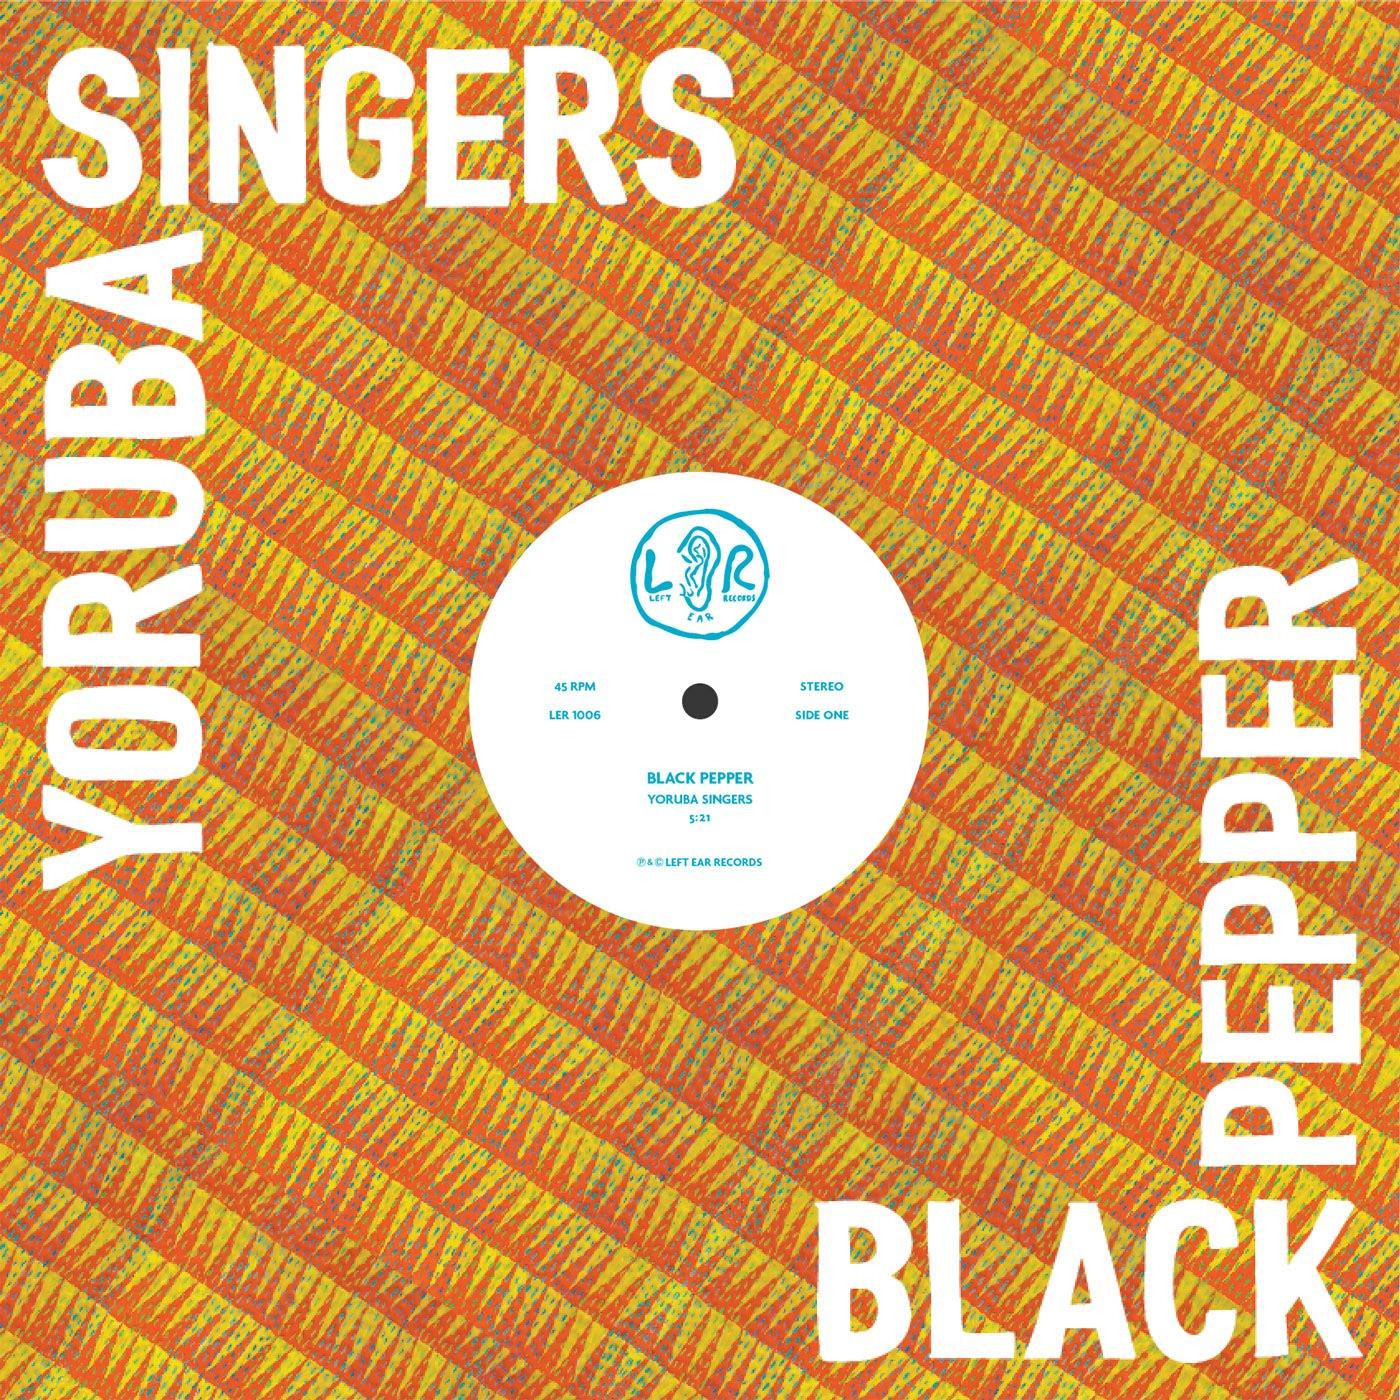 YORUBA SINGERS - BLACK PEPPER (LEFT EAR RECORDS, 2016)